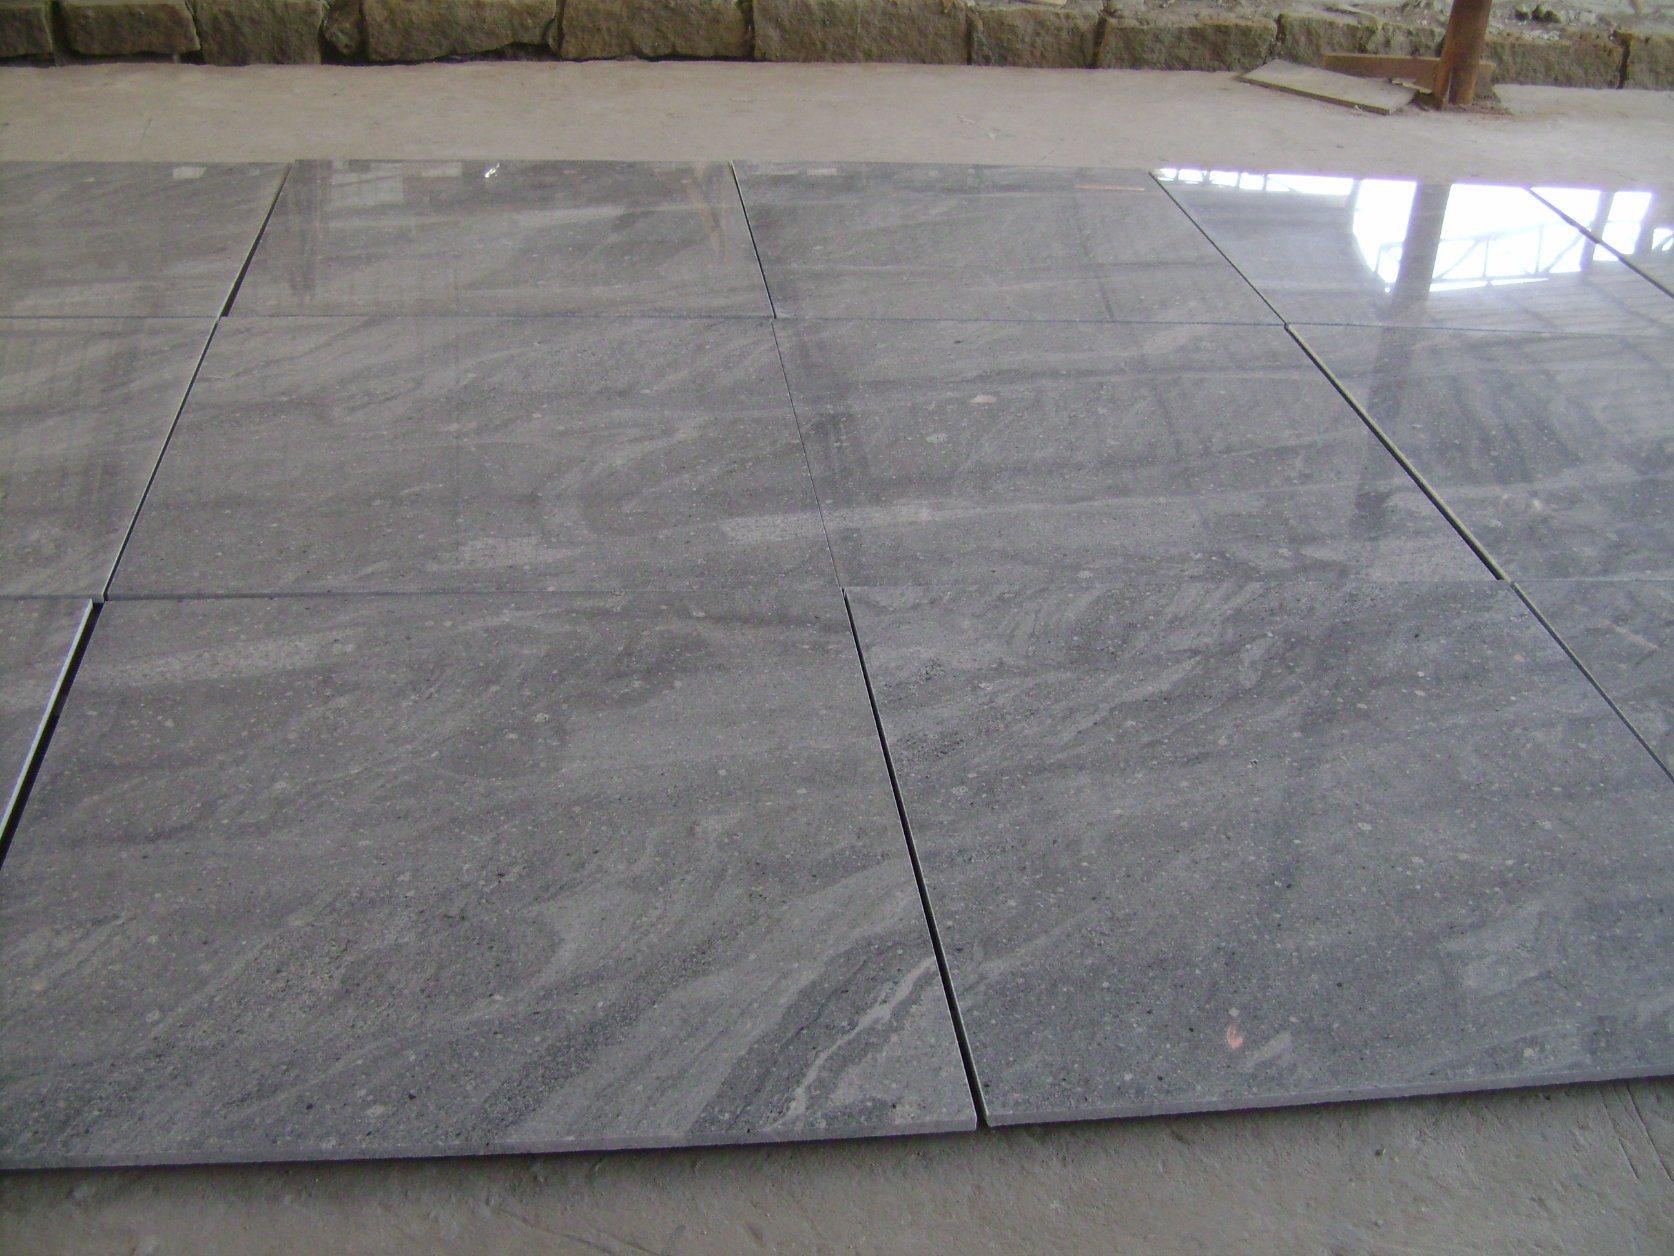 Atlatic Gray China Grey Granite Tiles Slabs Floor Wall China Granite Tiles Granite Floor Covering